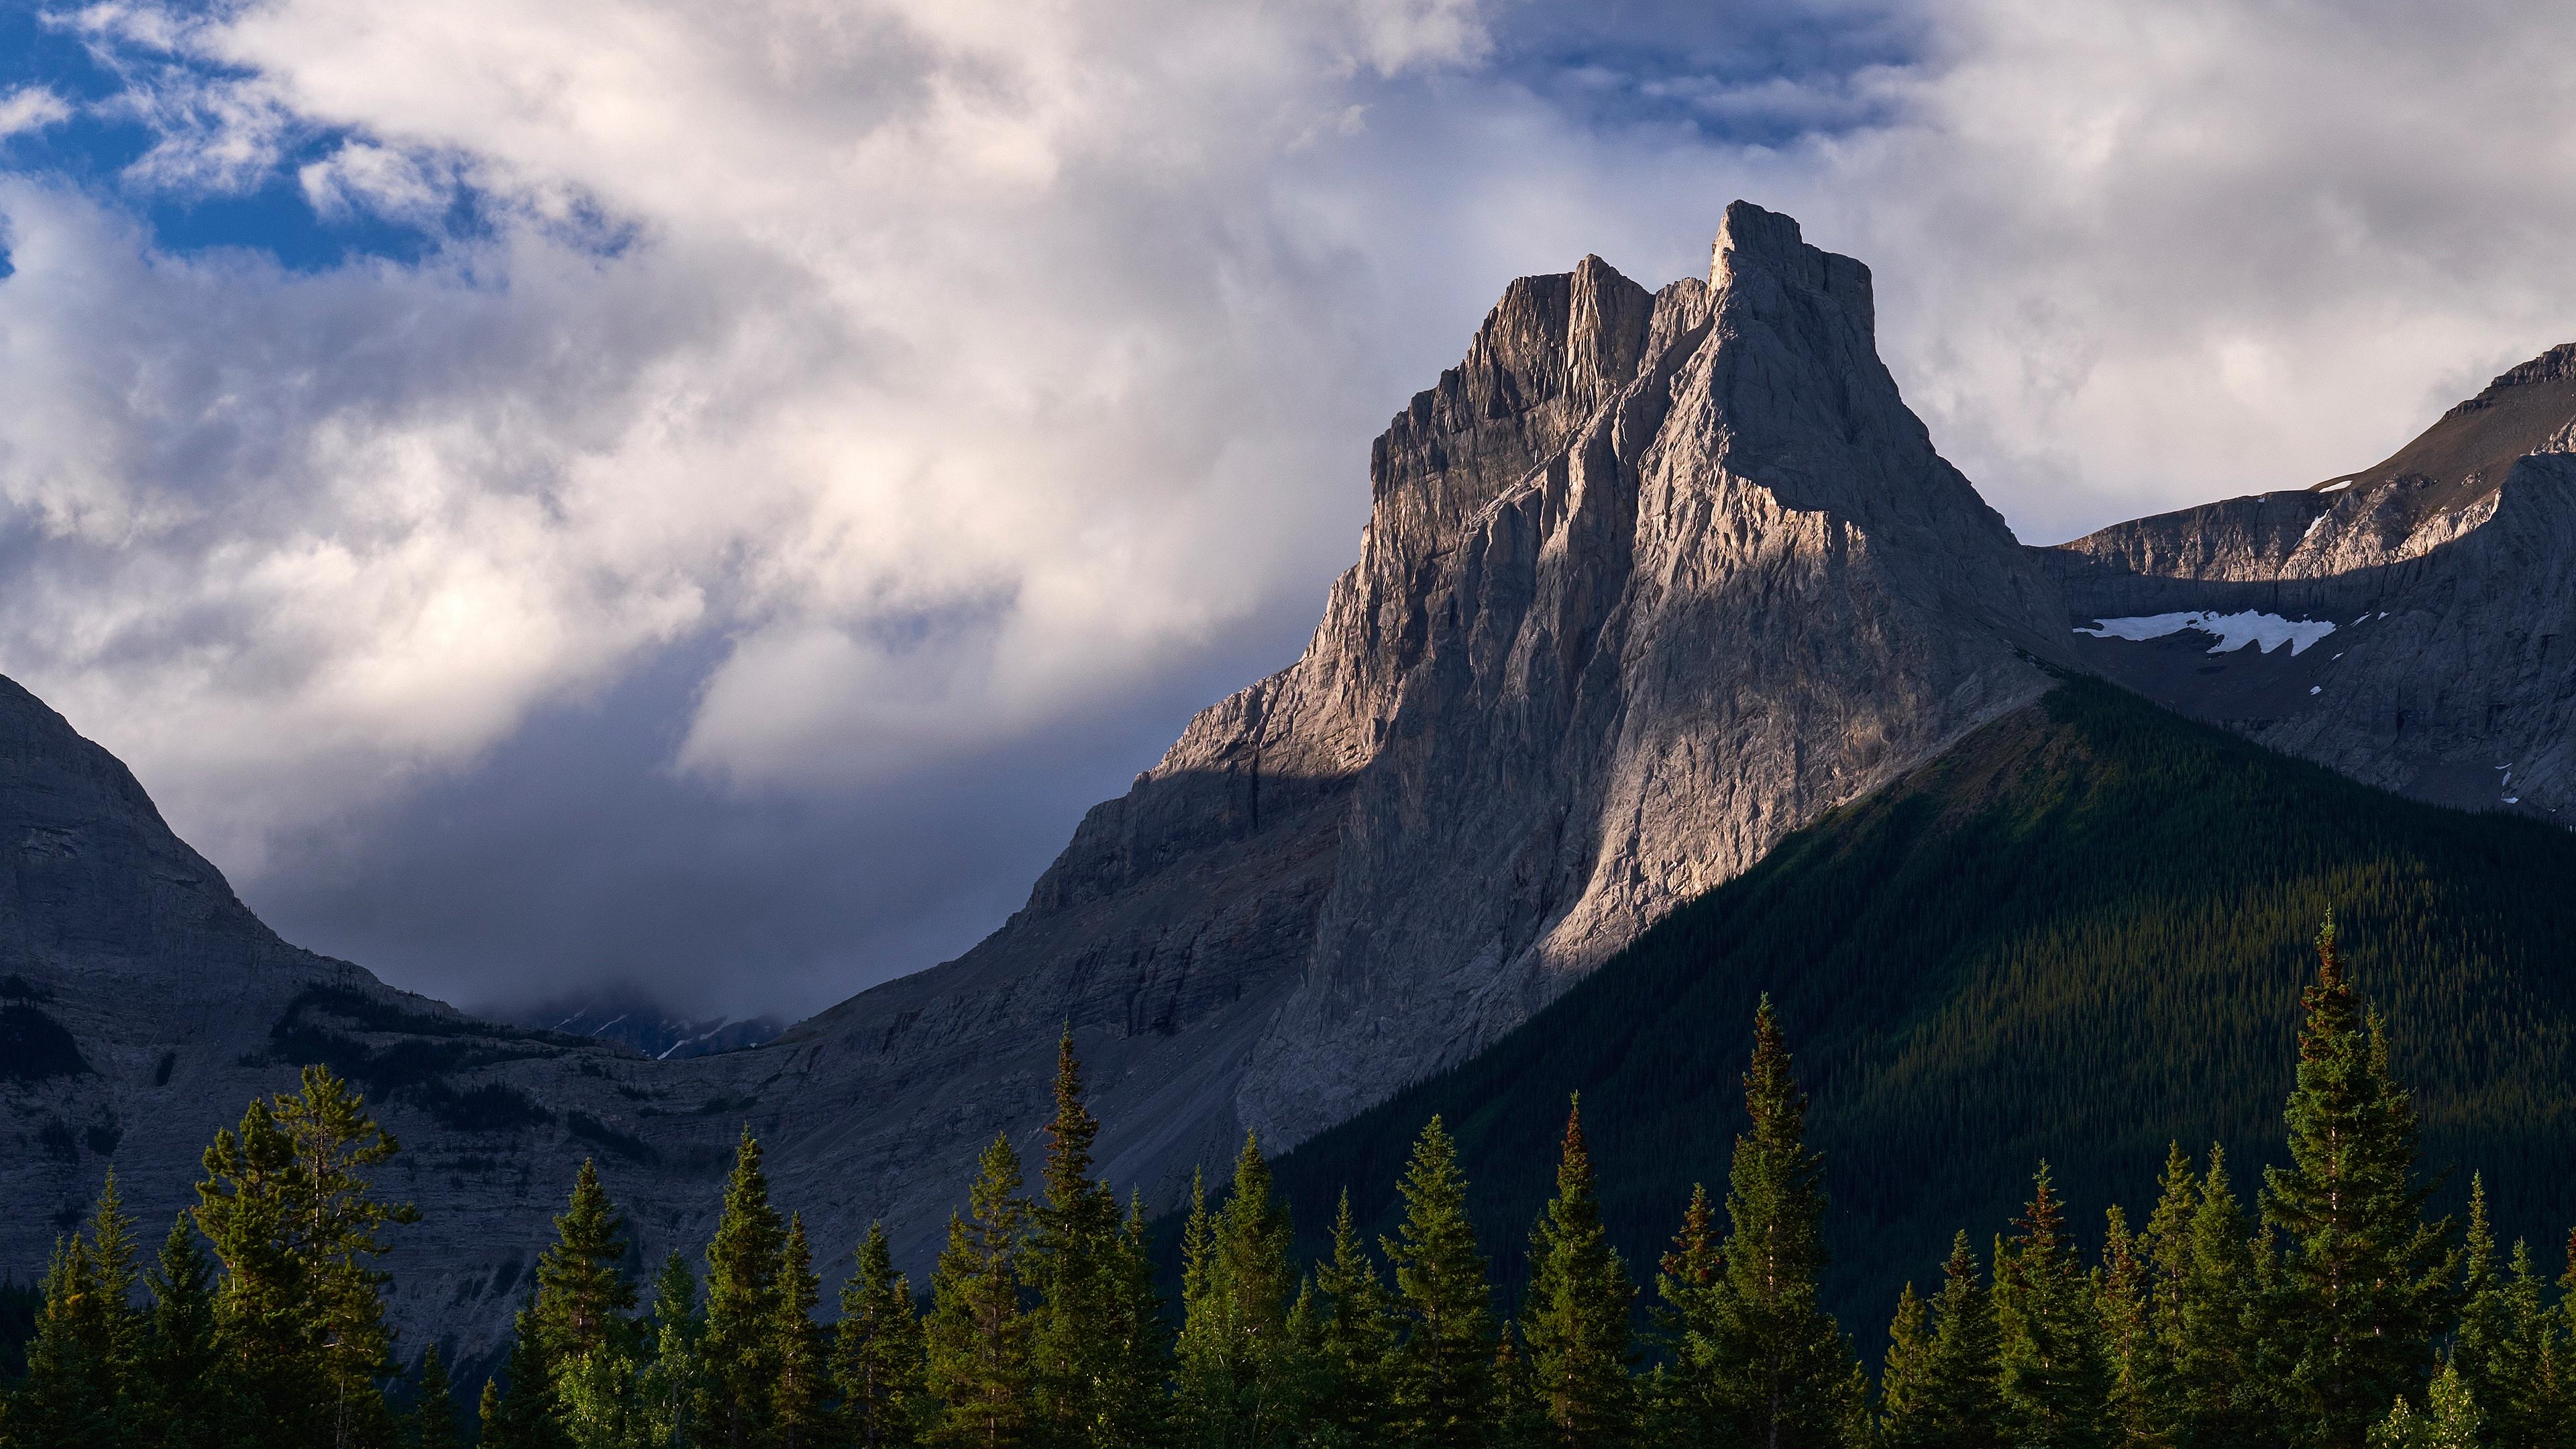 General 3840x2160 nature landscape mountains clouds